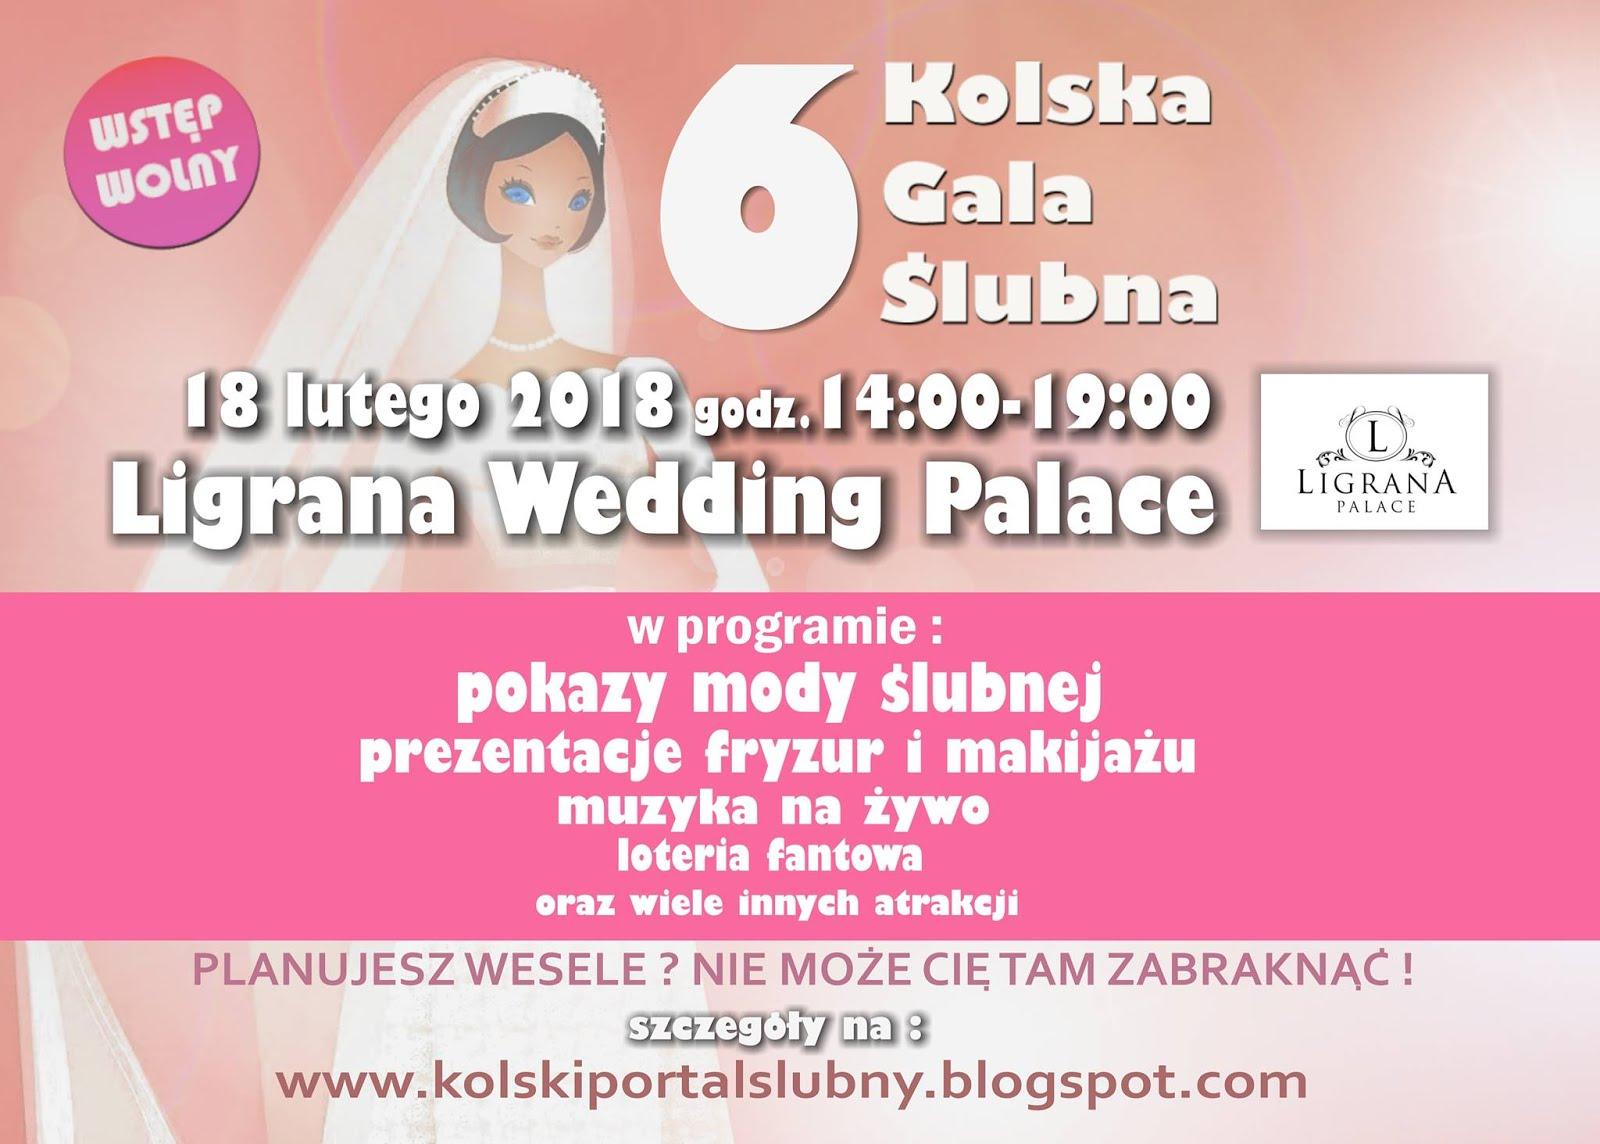 5 Kolska Gala Ślubna